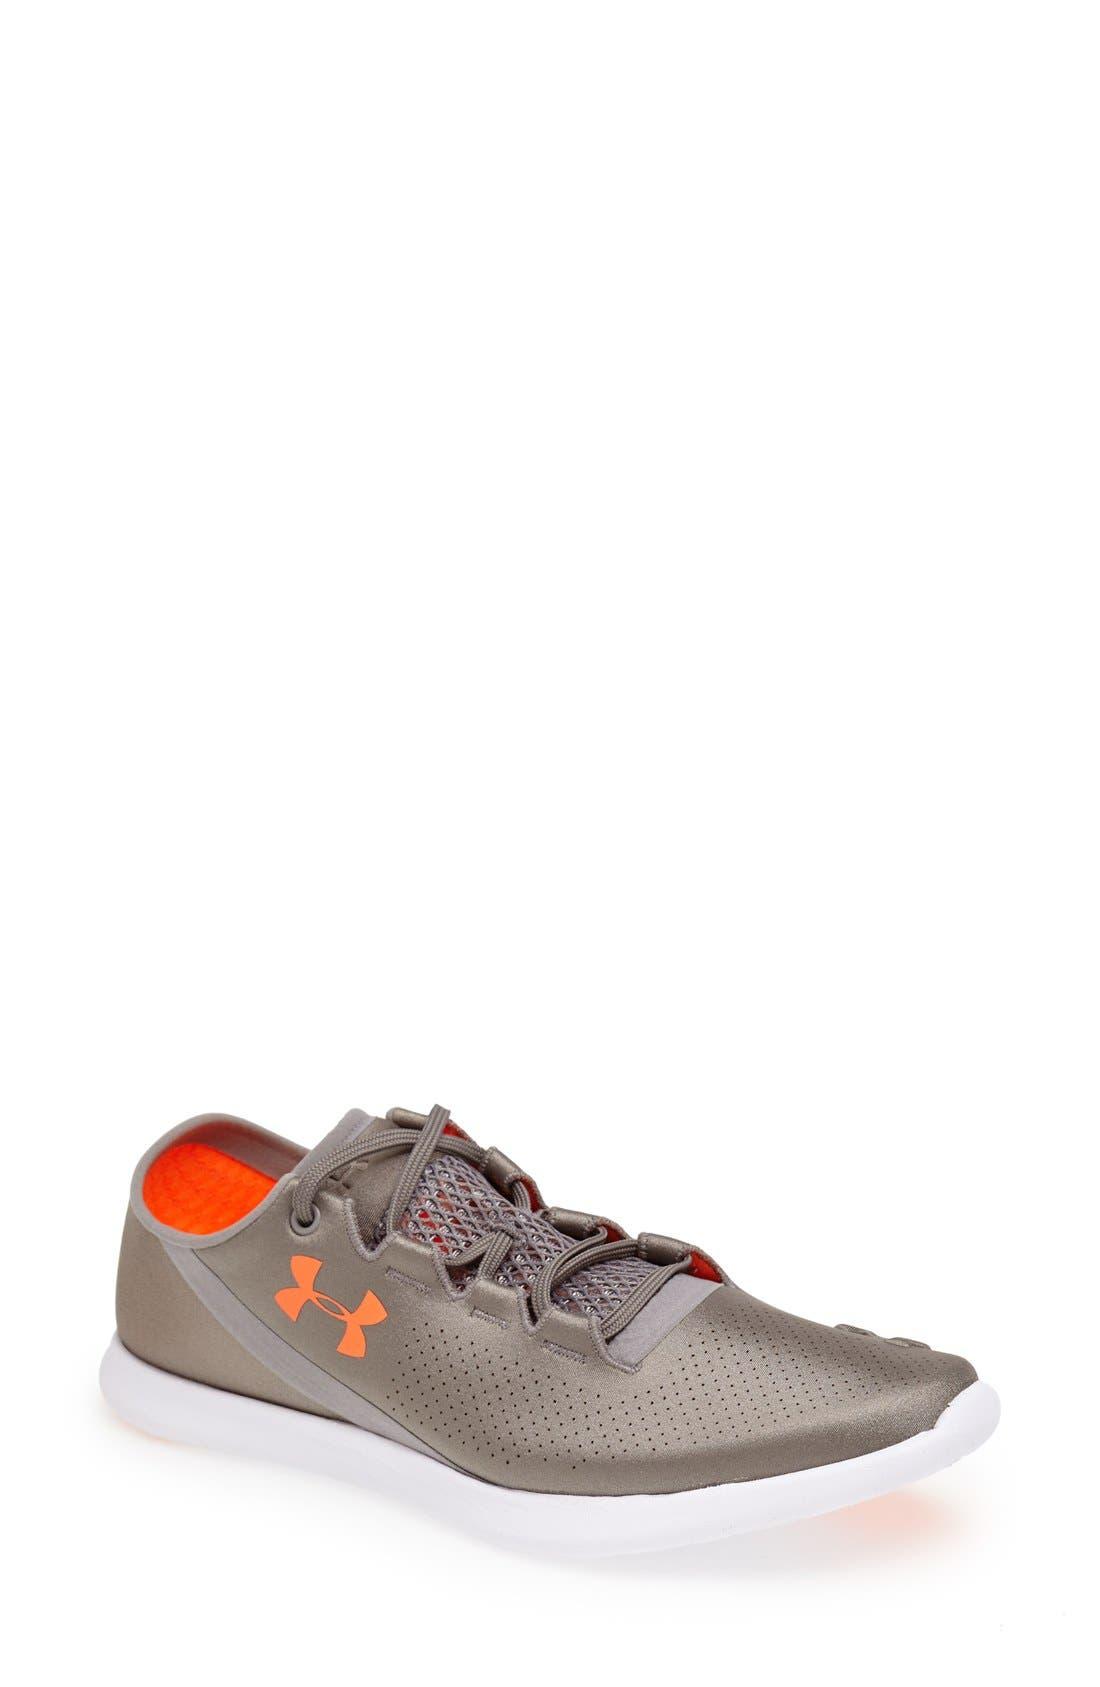 Main Image - Under Armour 'Speedform® Studiolux™' Training Shoe (Women)